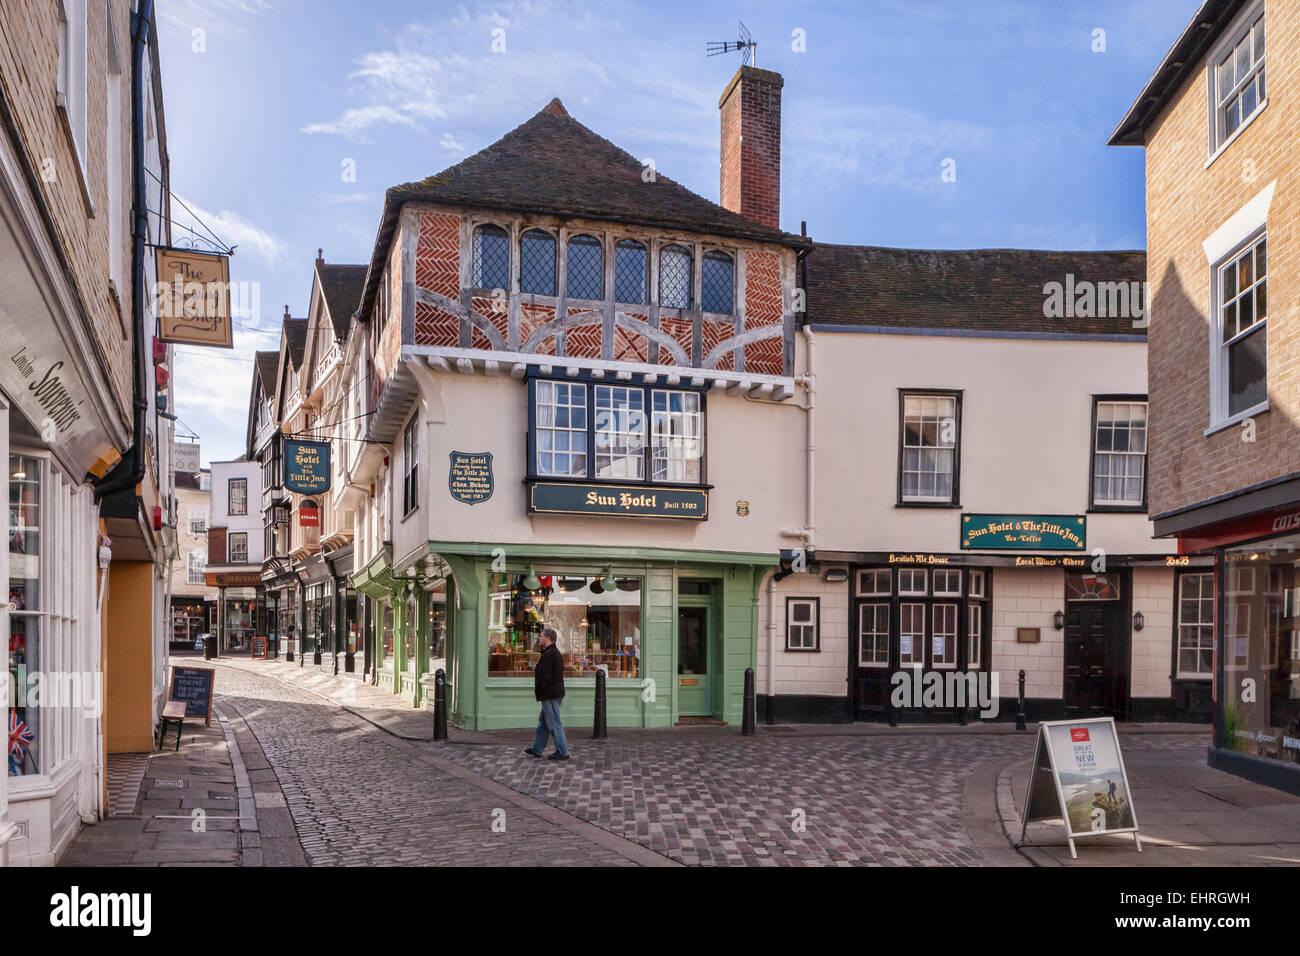 Il Sun hotel in Sun Street, Canterbury, nel Kent, Inghilterra. Immagini Stock